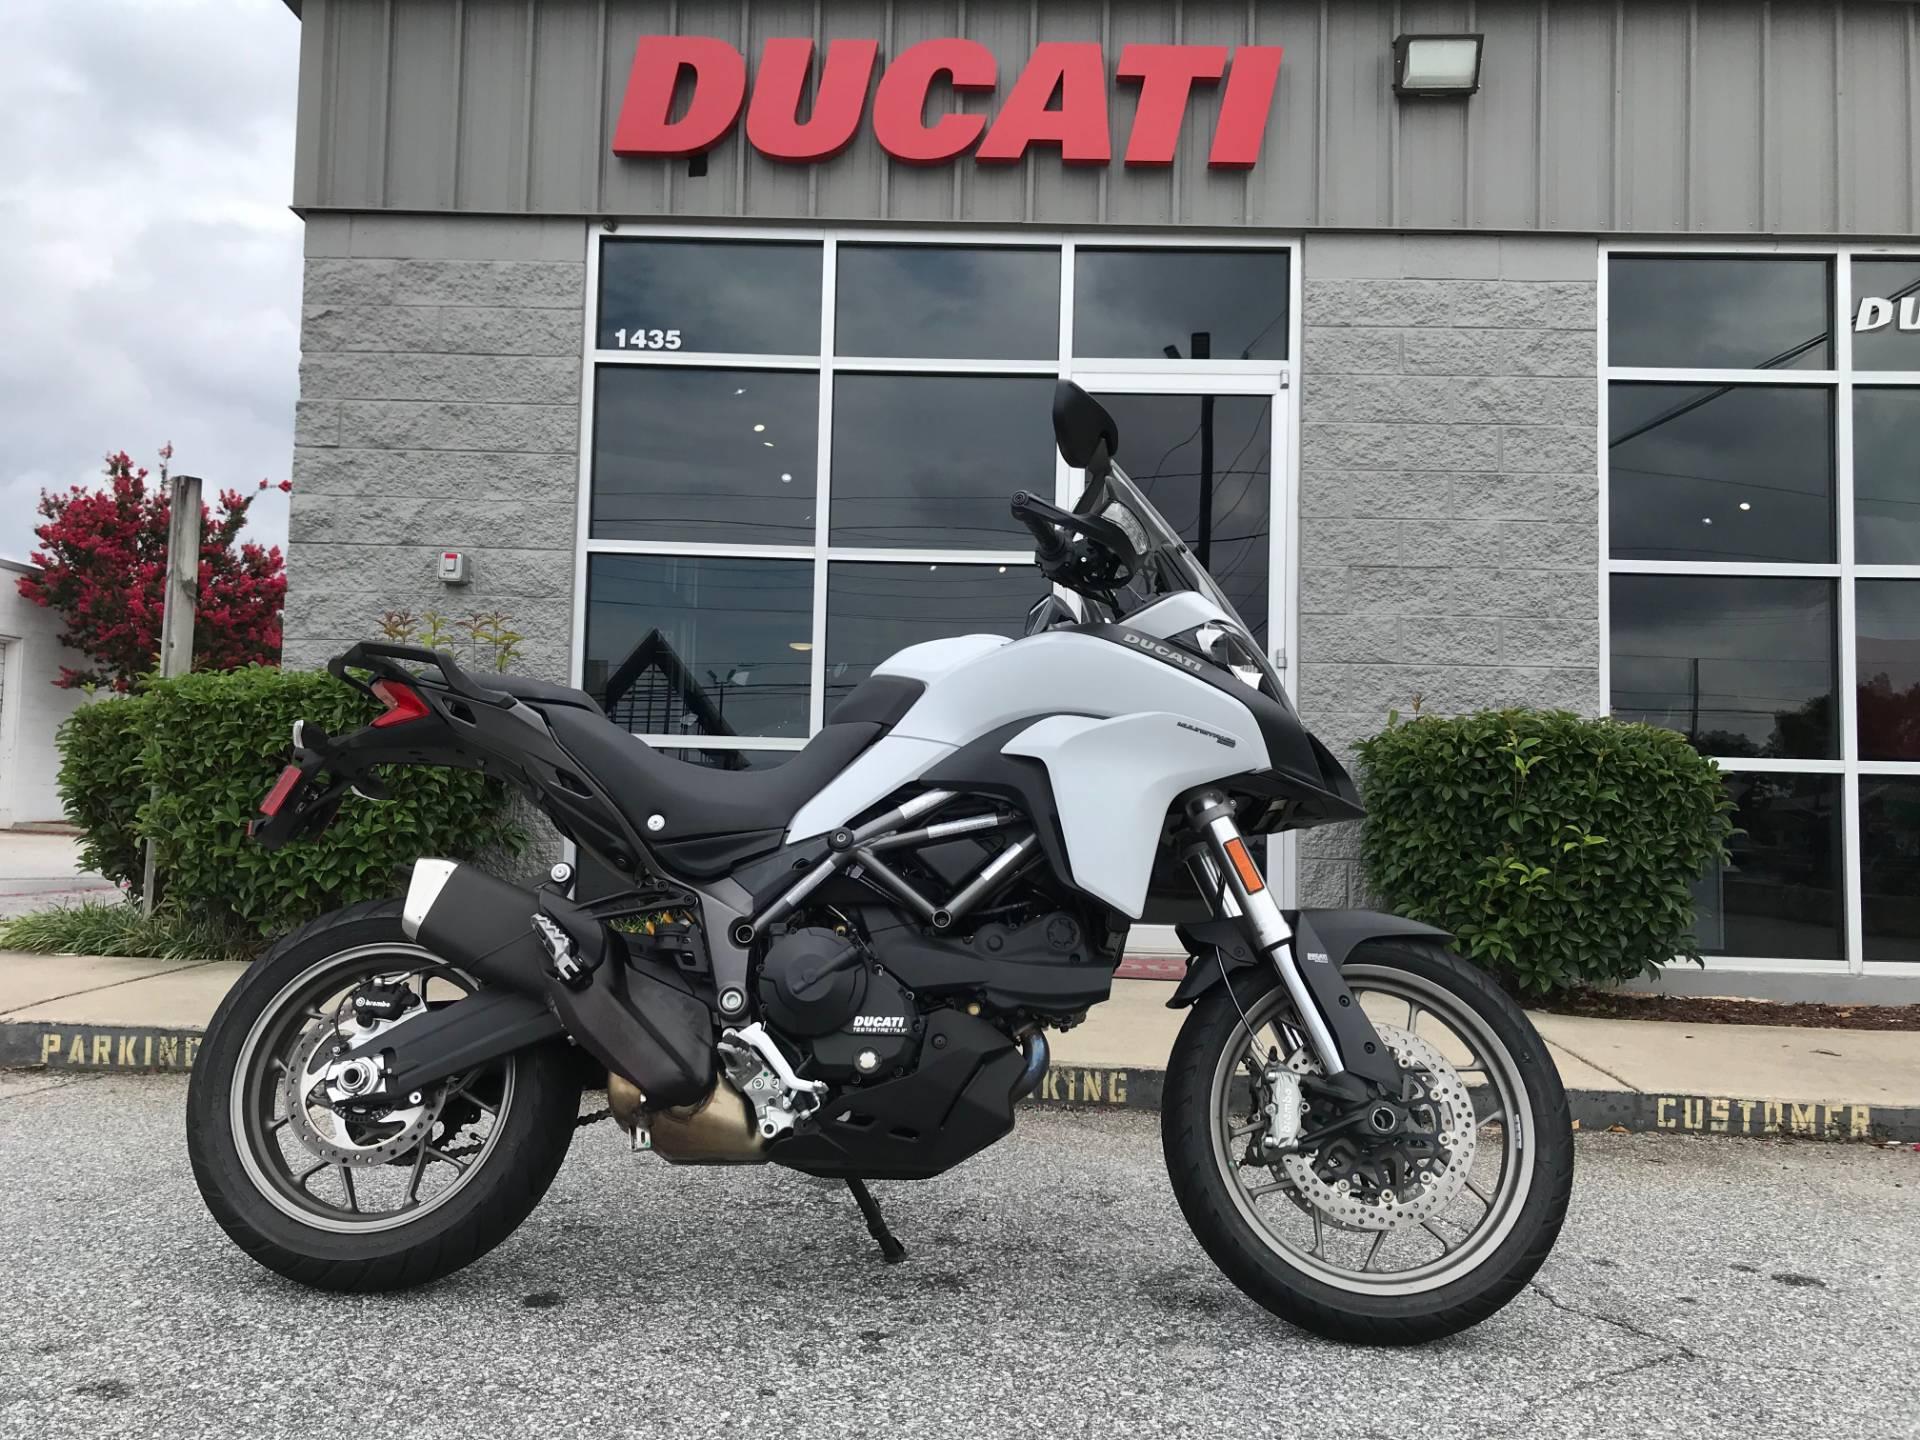 2017 Ducati Multistrada 950 in Greenville, South Carolina